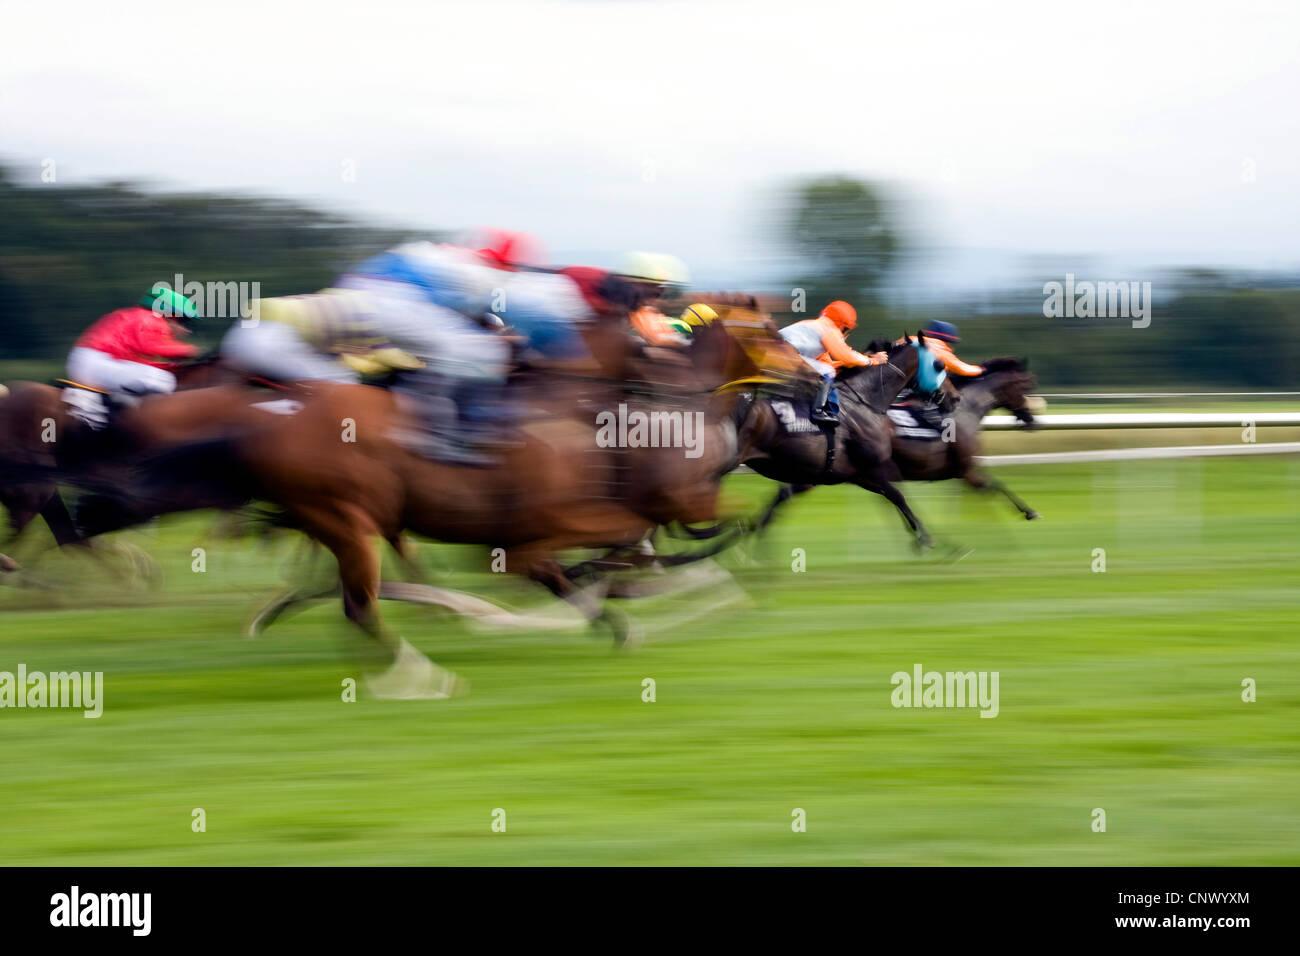 horse race, Germany, Baden-Wuerttemberg, Baden-Baden - Stock Image